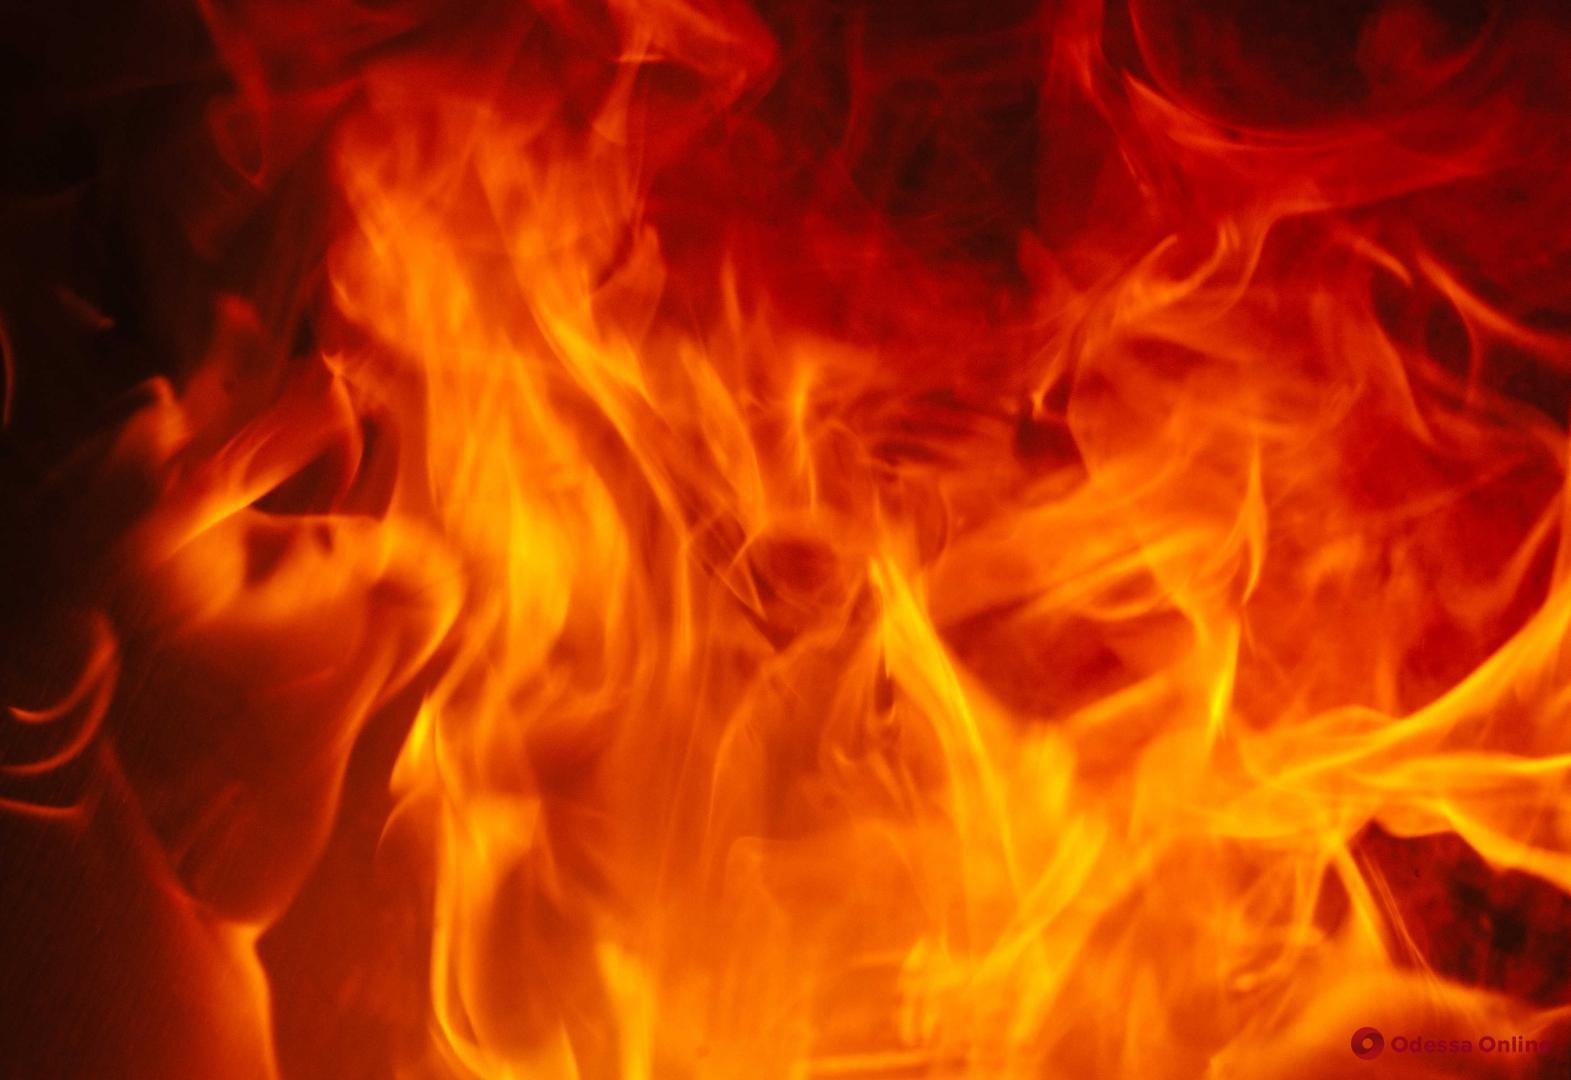 На Пересыпи во время пожара погиб мужчина